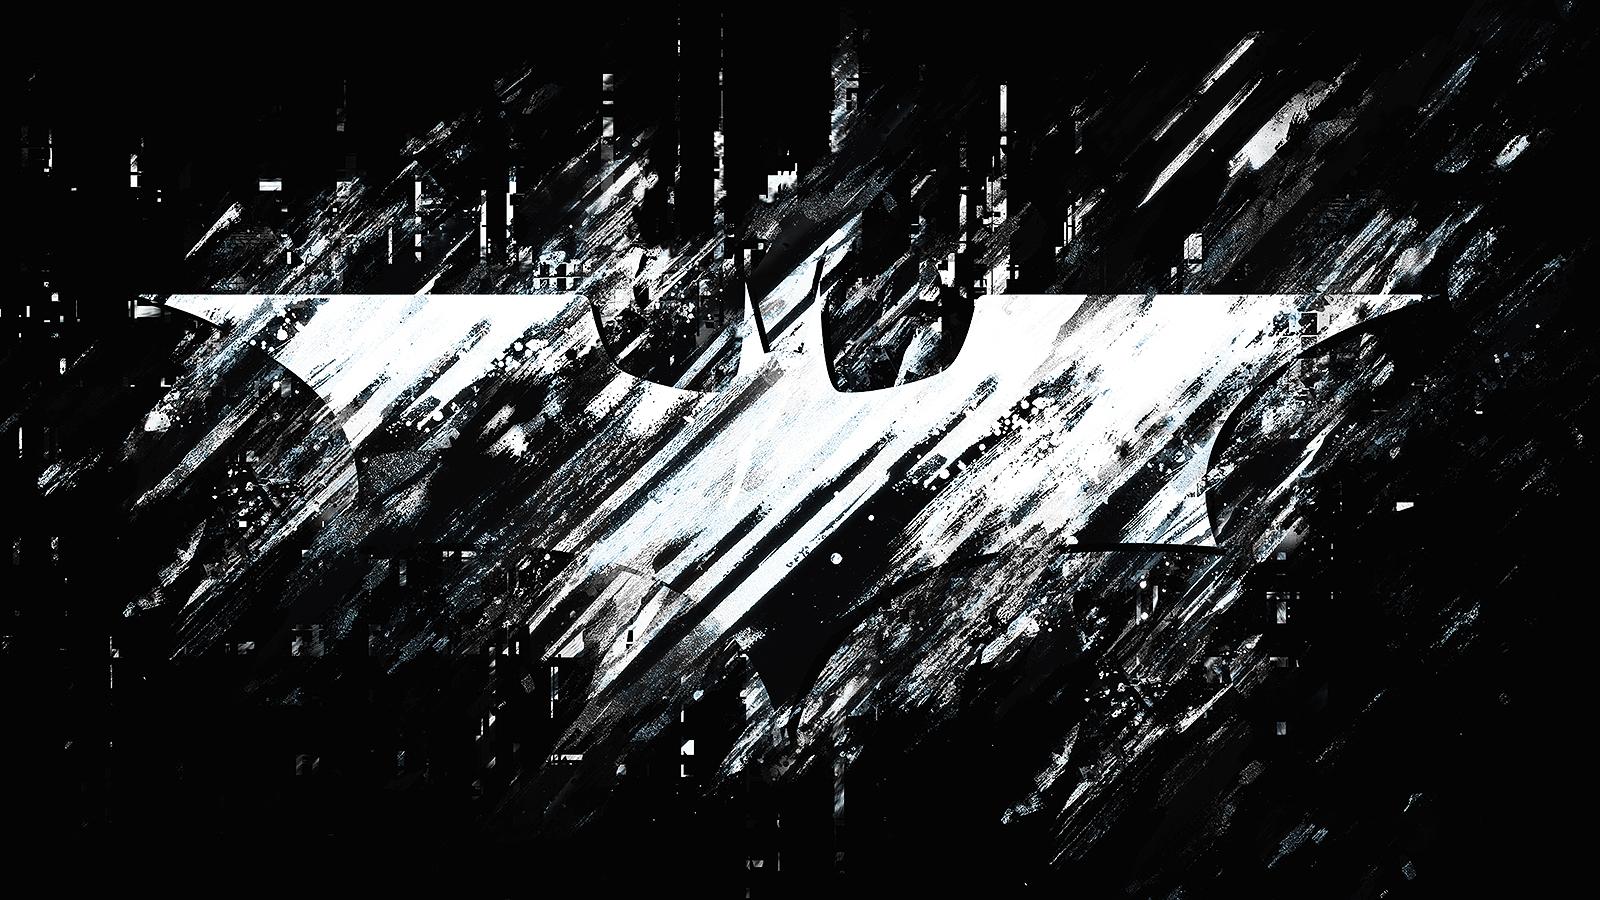 bane batman dark knight rises wallpapers - The Dark Knight Rises HD wallpapers Batman movie